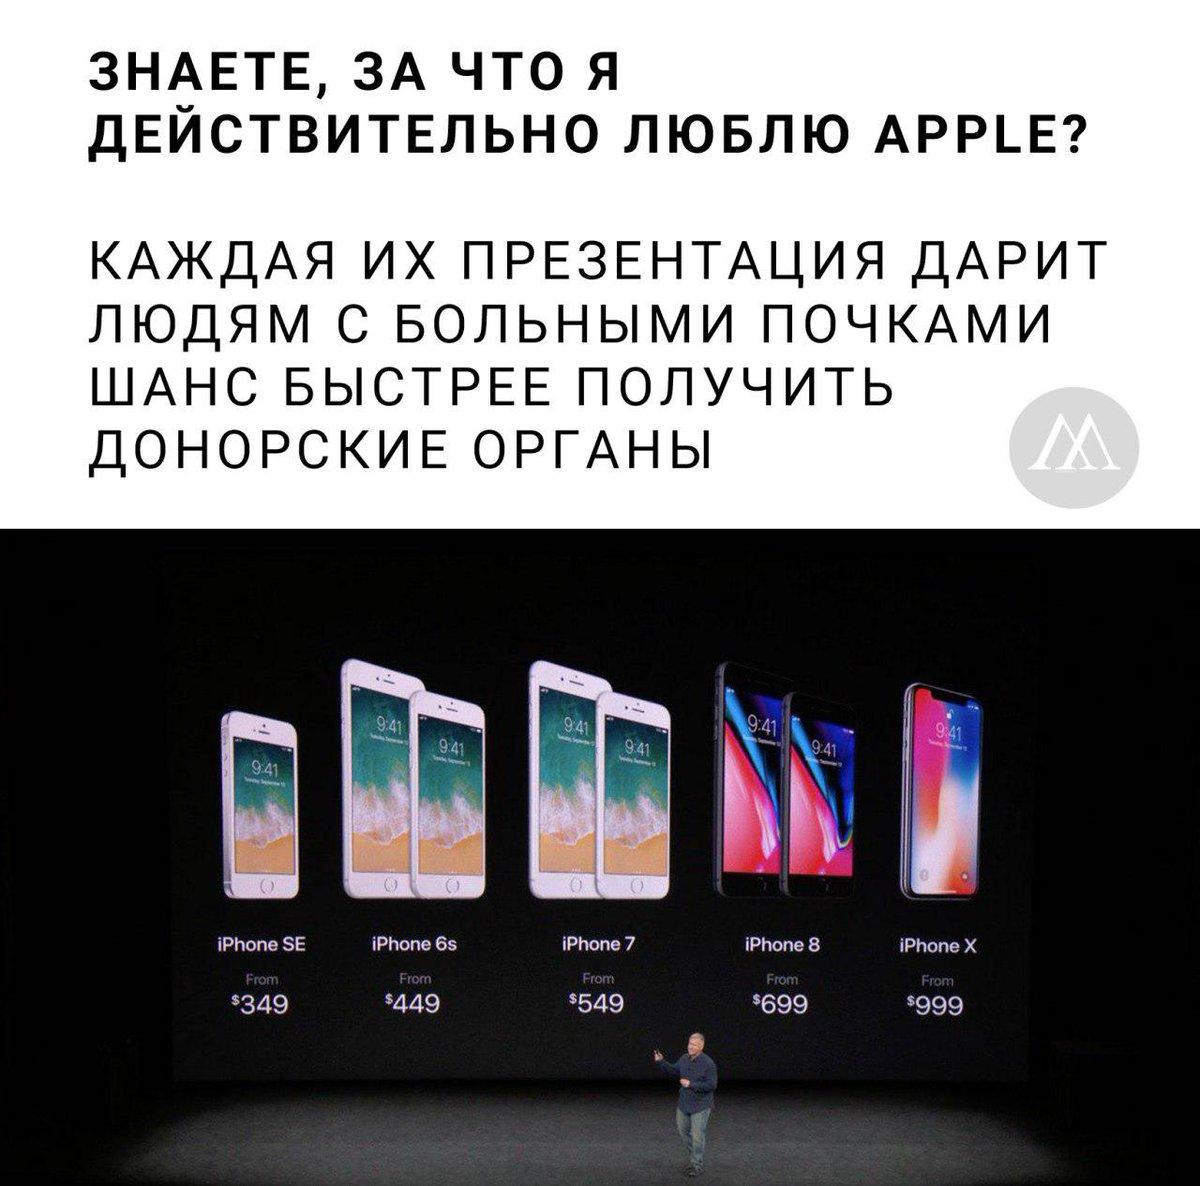 Презентация apple весна 2017 macbook 12